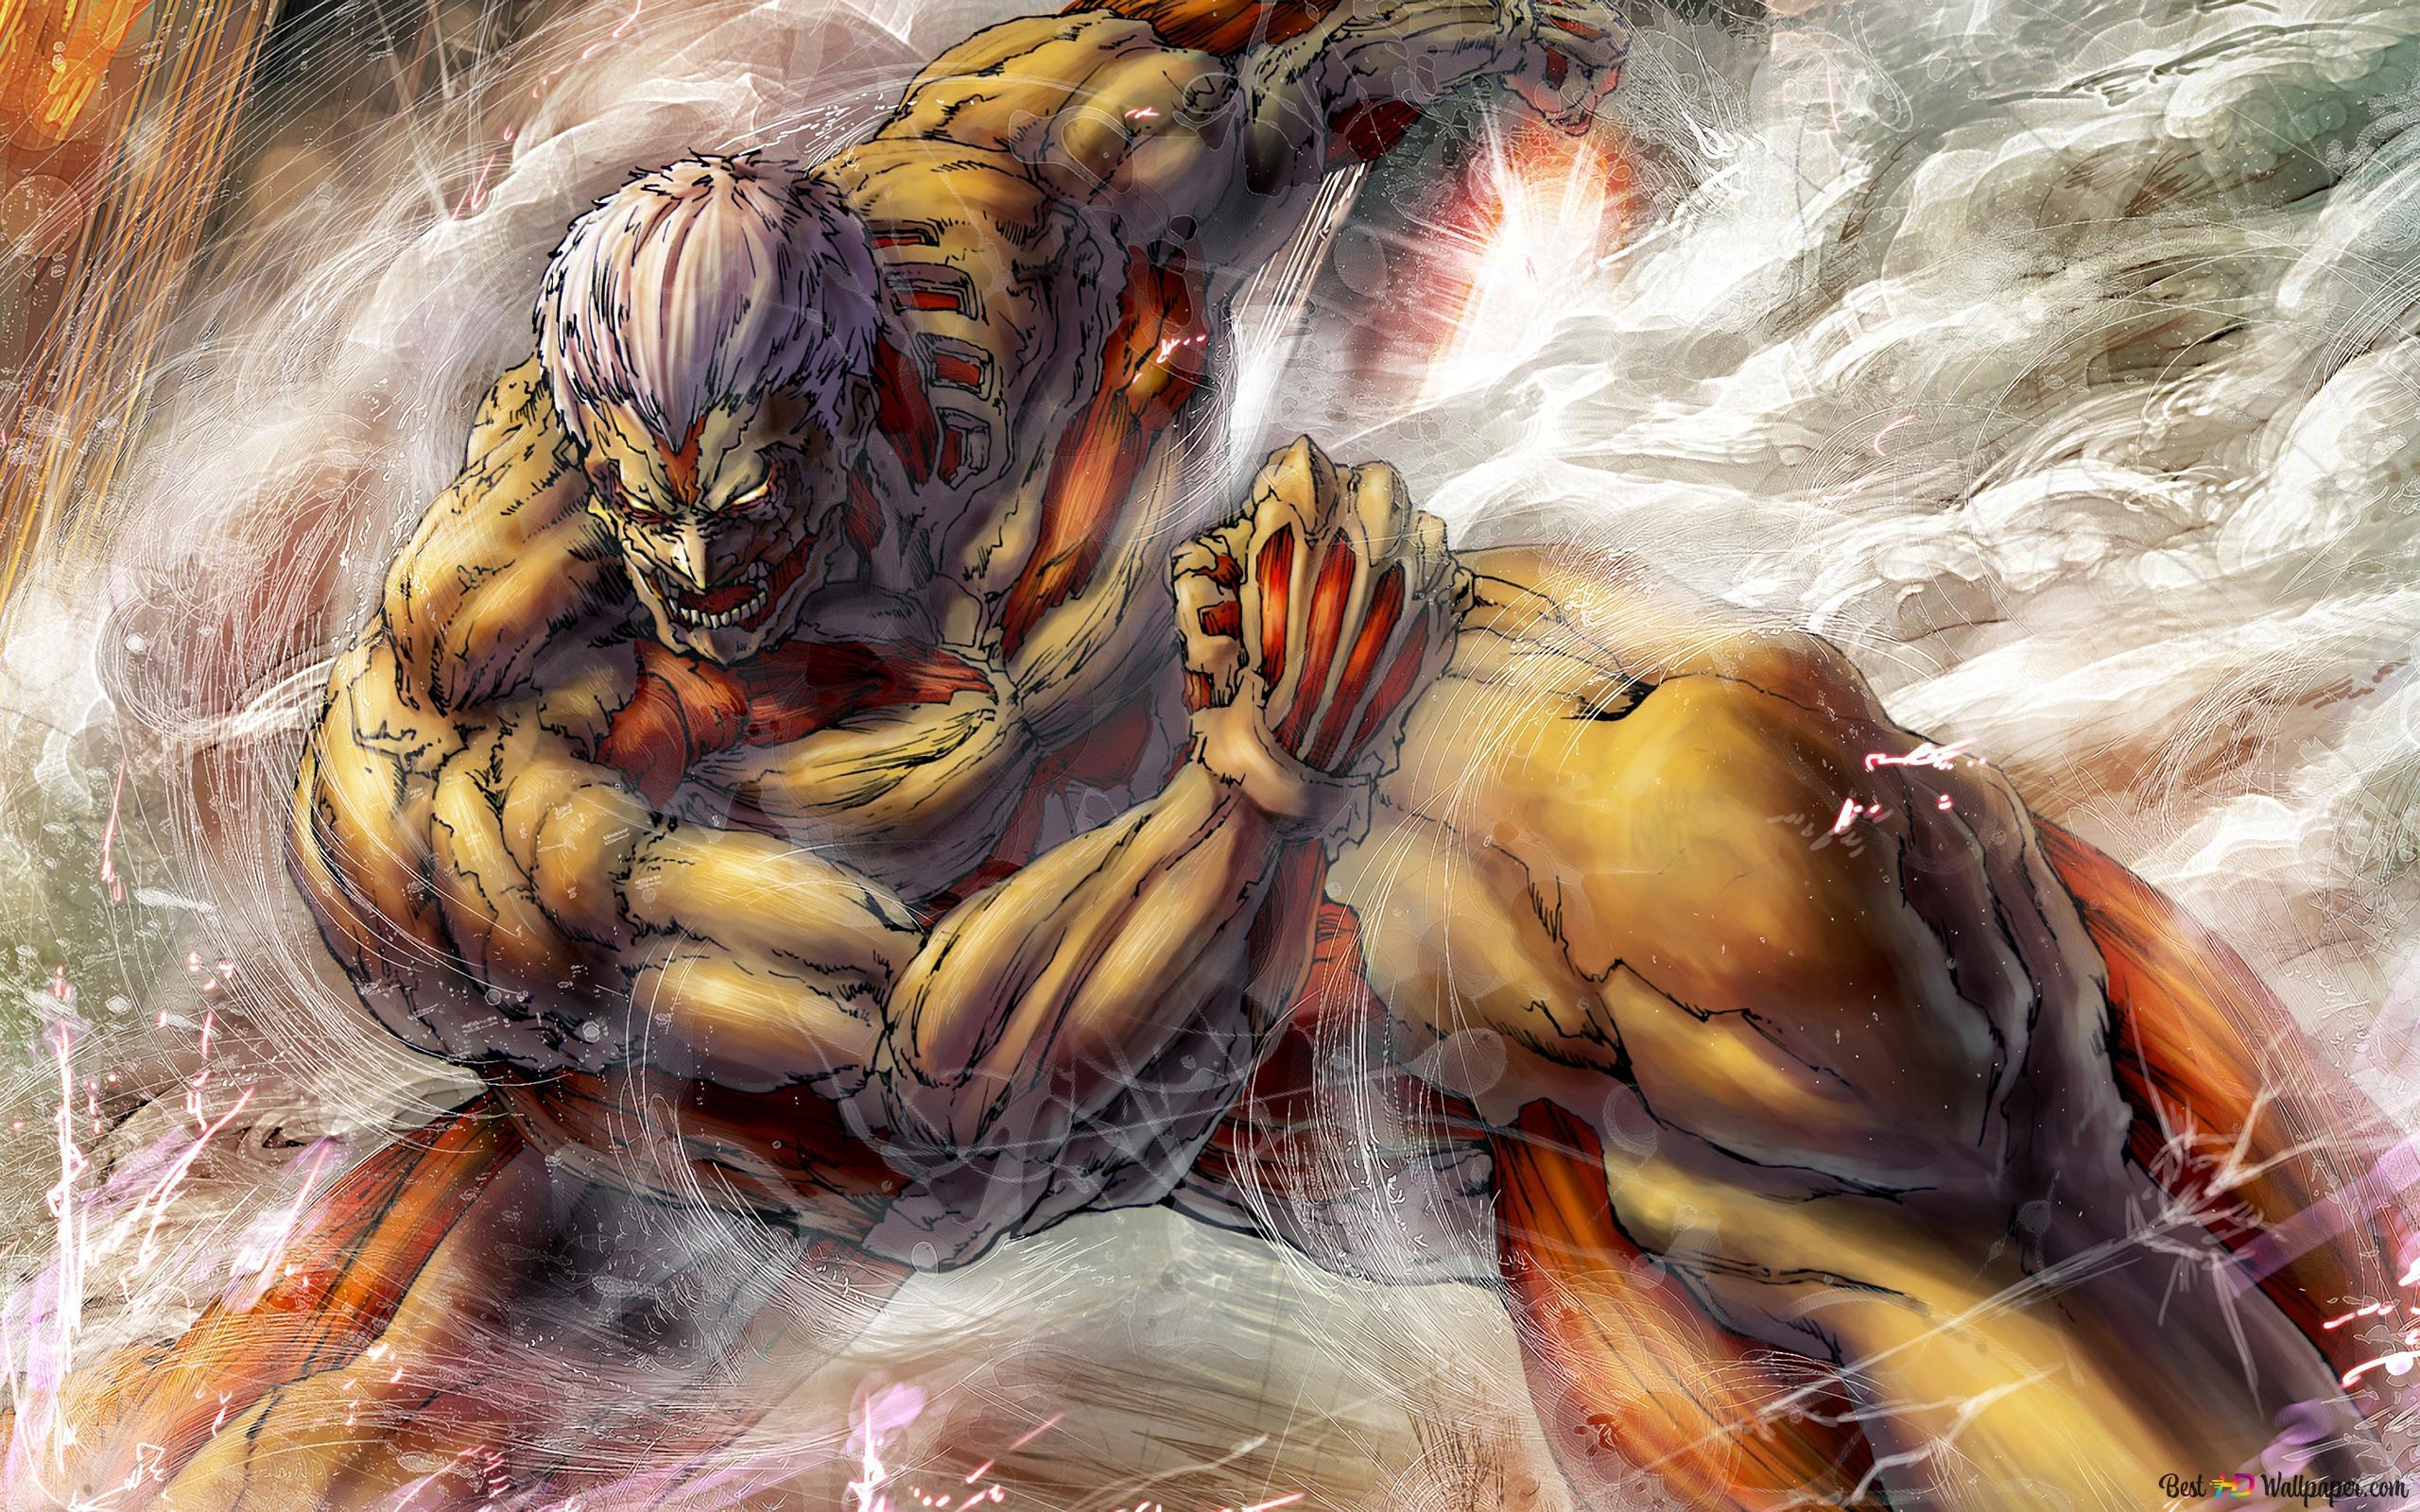 Titan Attack On Titan Hd Wallpaper Download